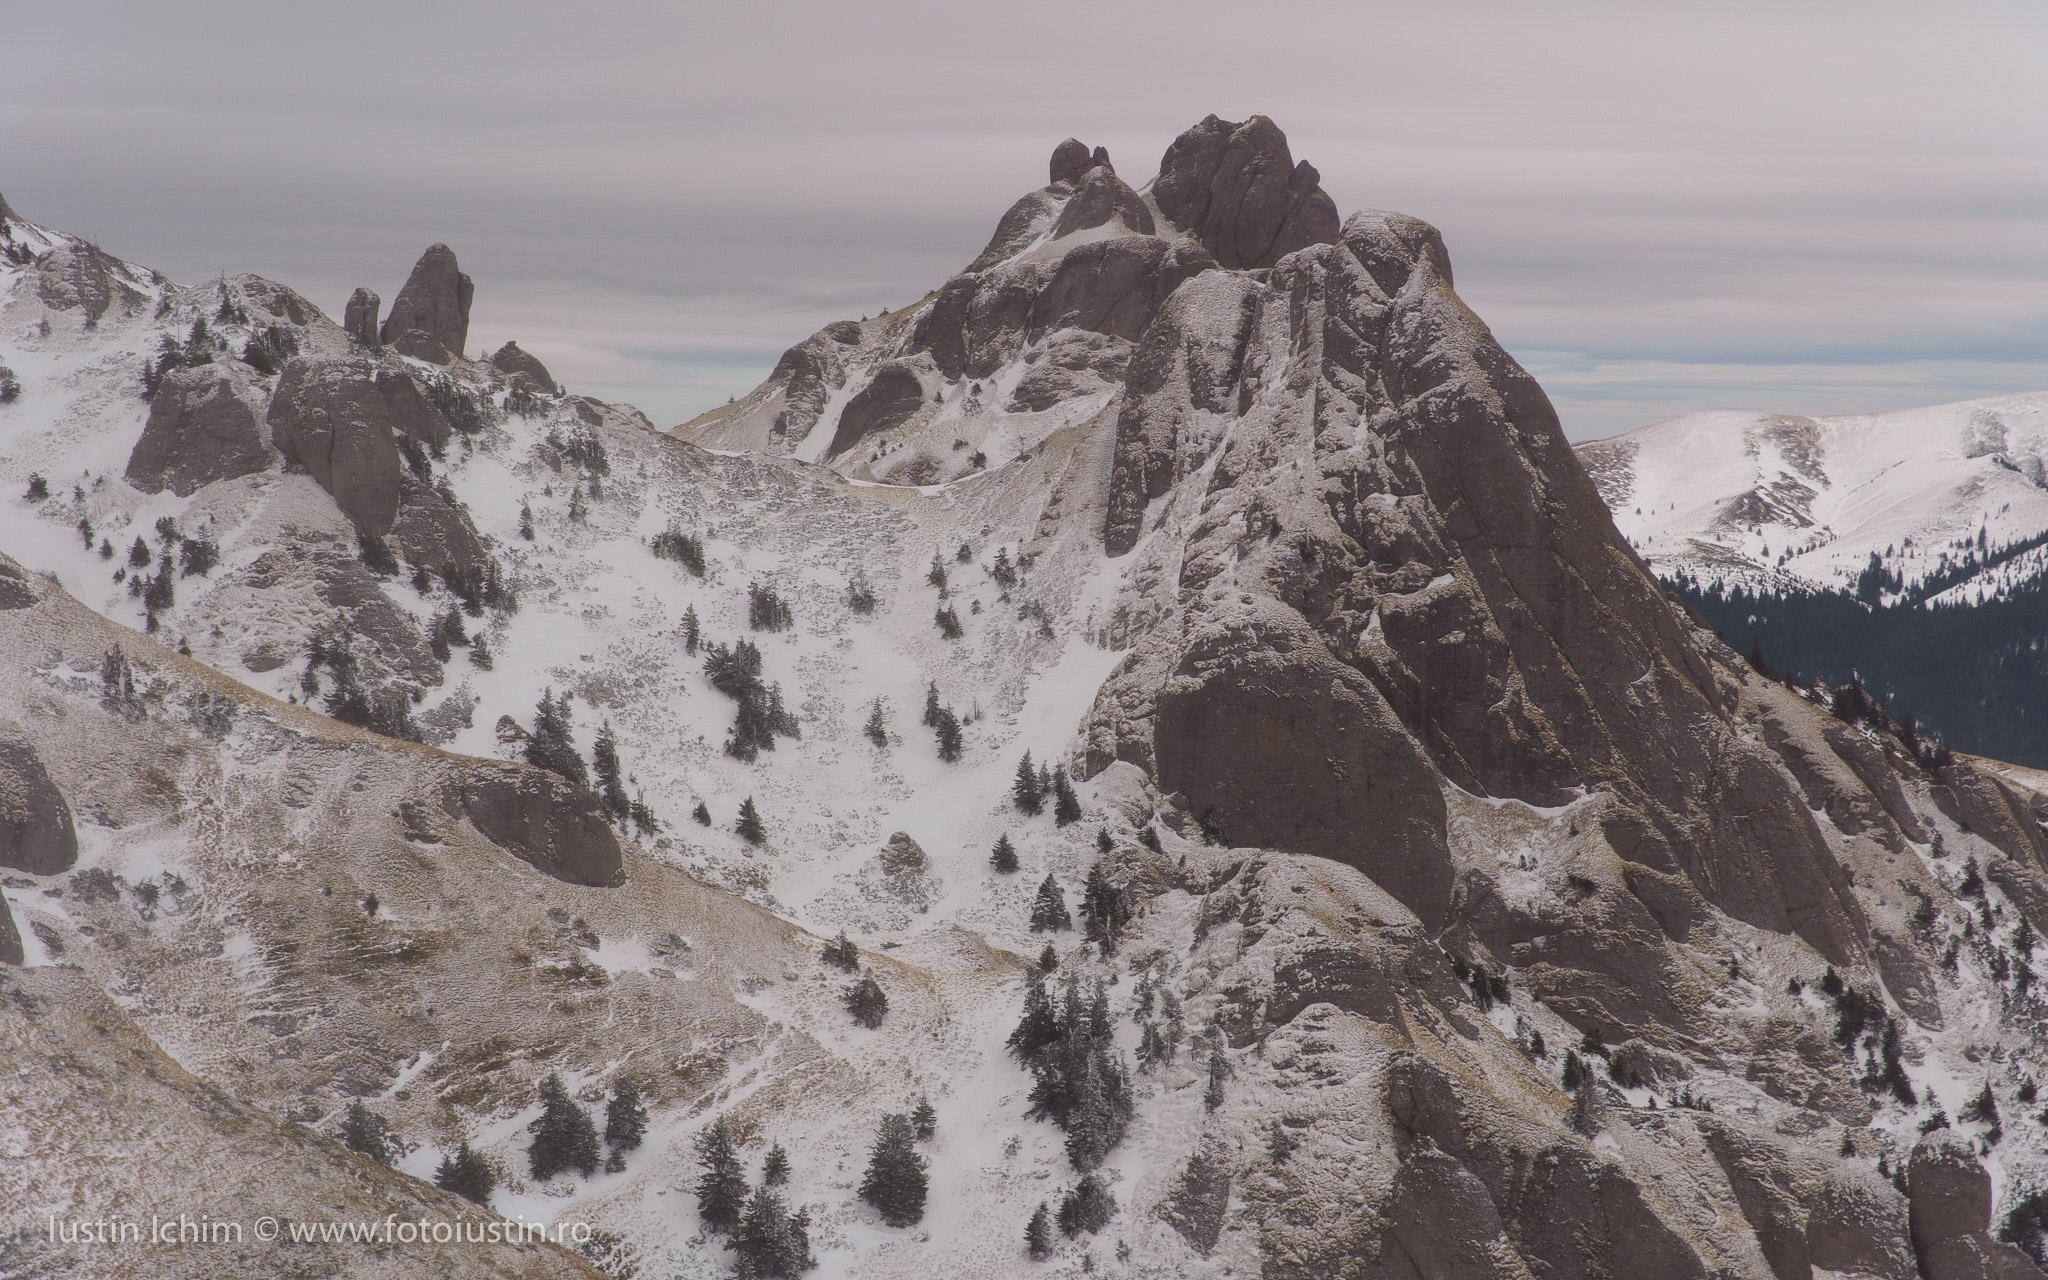 Munții Ciucaș